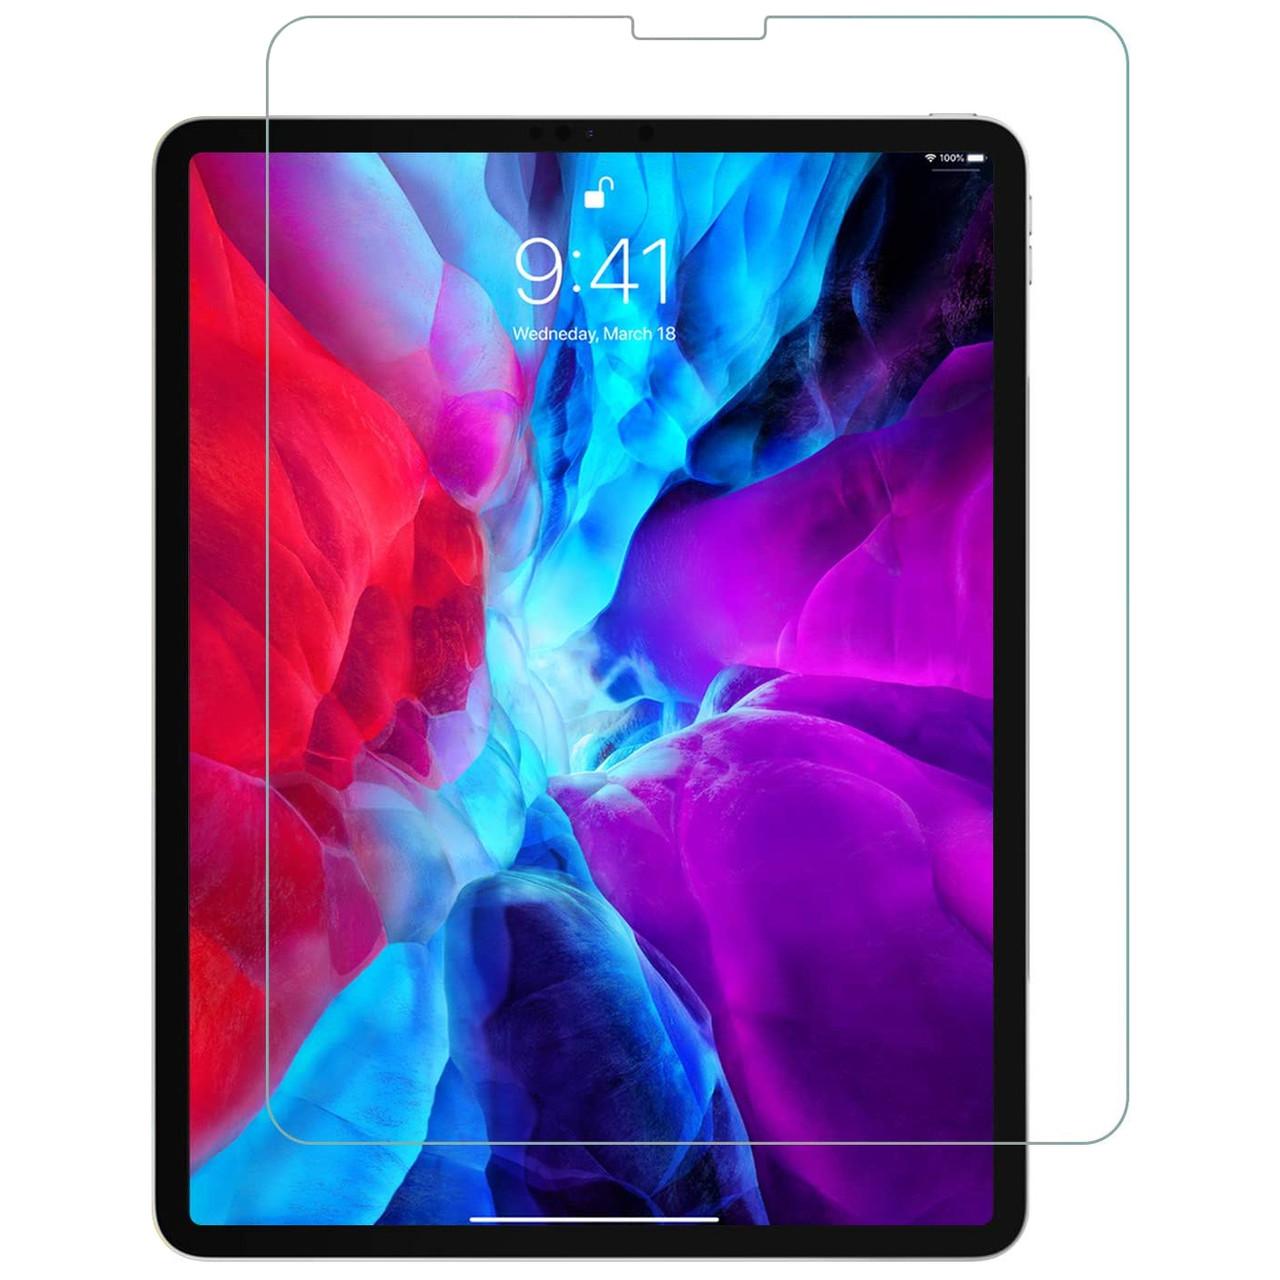 "Защитное стекло Ultra Plus 0.33mm (без упаковки) для Apple iPad Pro 11"" (2018) /iPad Pro 11"" (2020)"